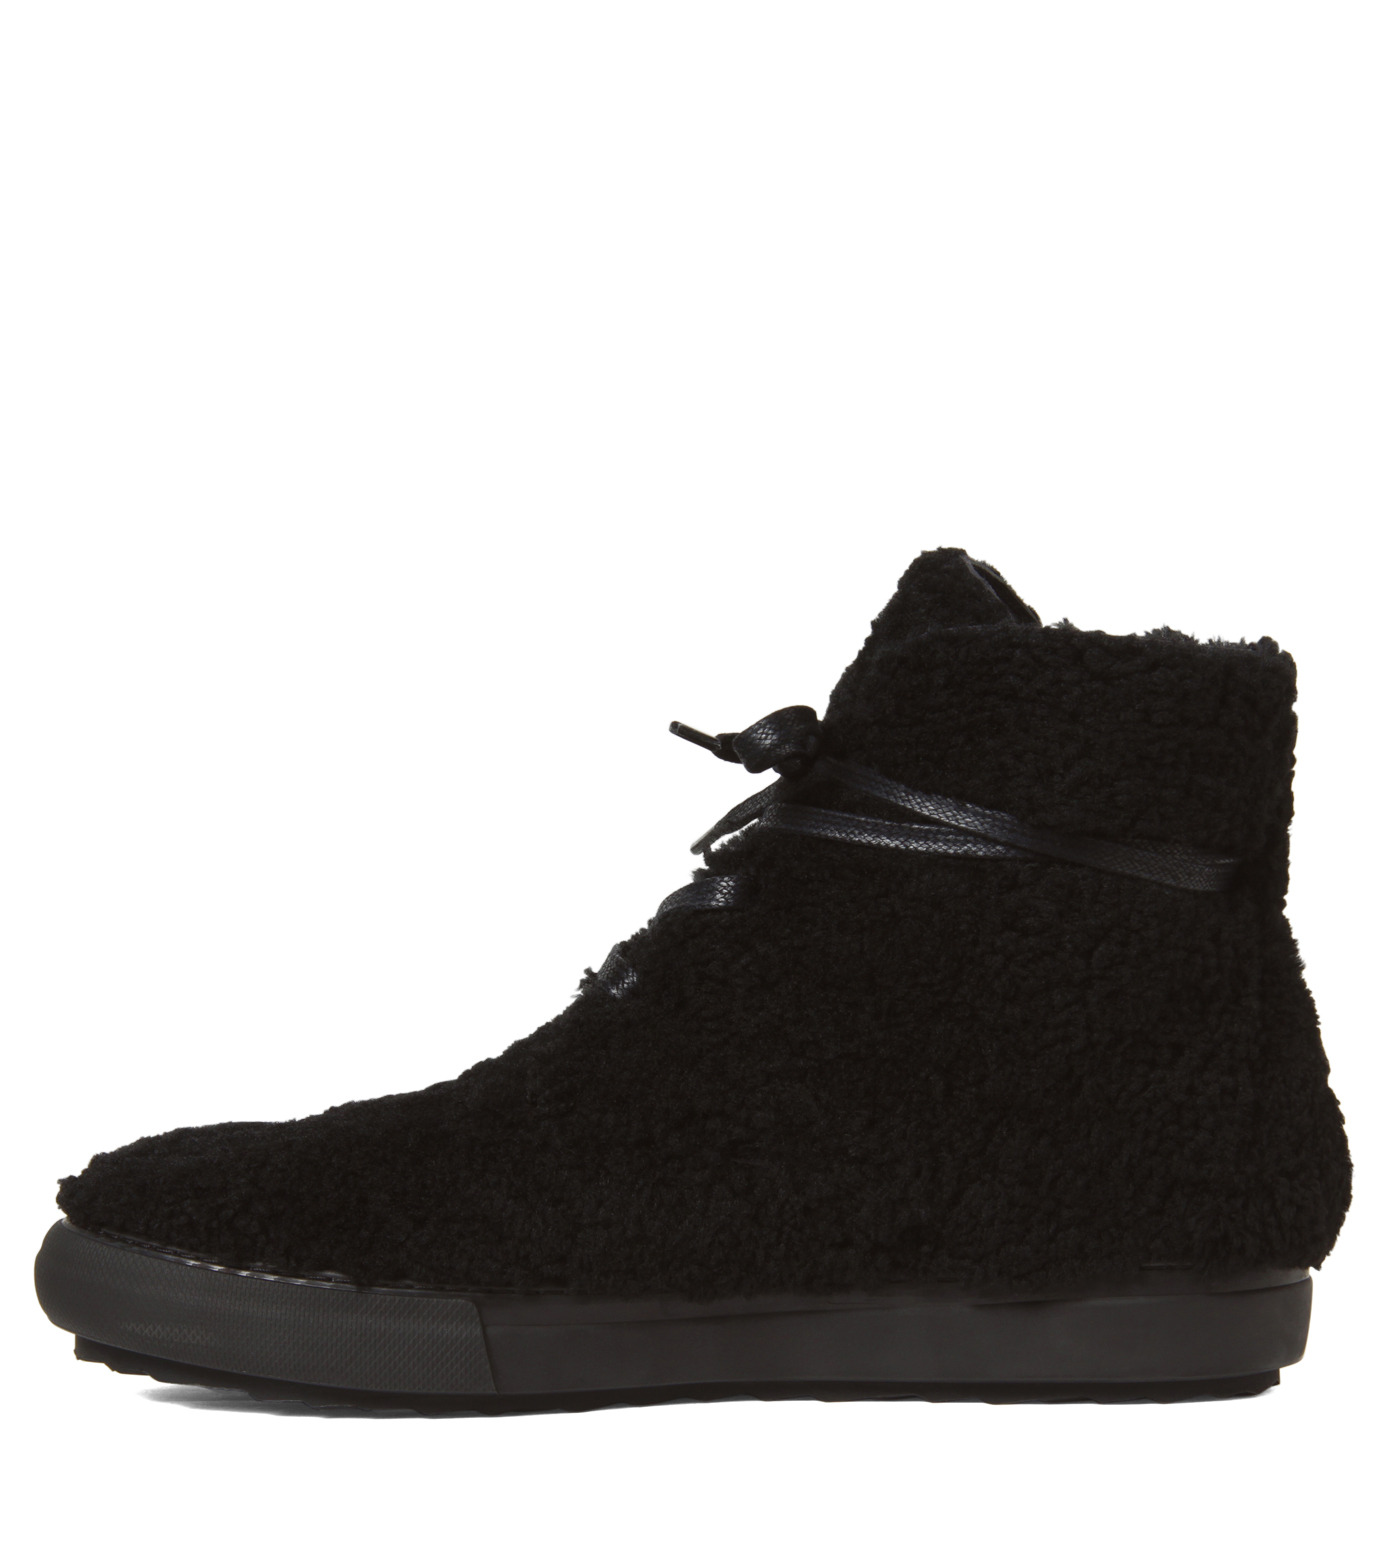 Pierre Hardy(ピエール アルディ)のMoutonChuckerBoots-BLACK(シューズ/shoes)-A4GX02SHEARL-13 拡大詳細画像2